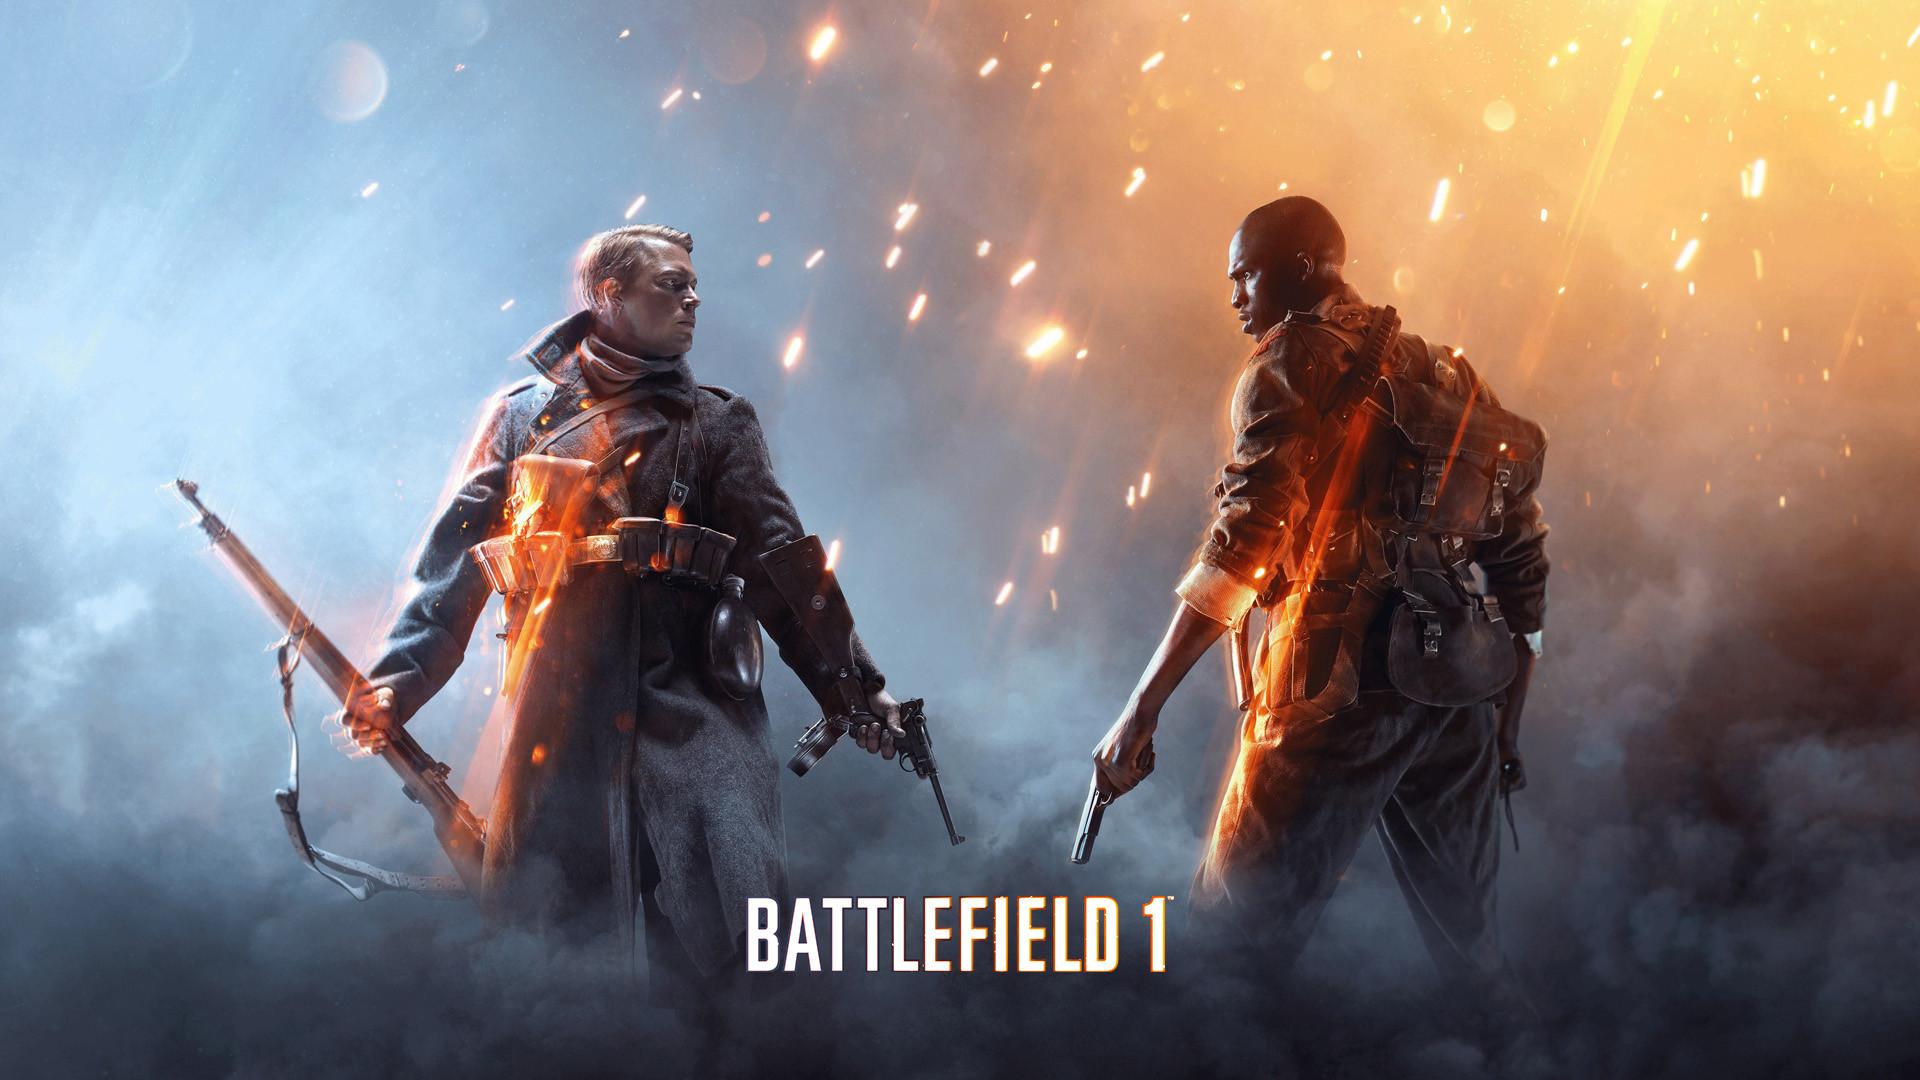 Battlefield 1 Wallpaper 72 Images